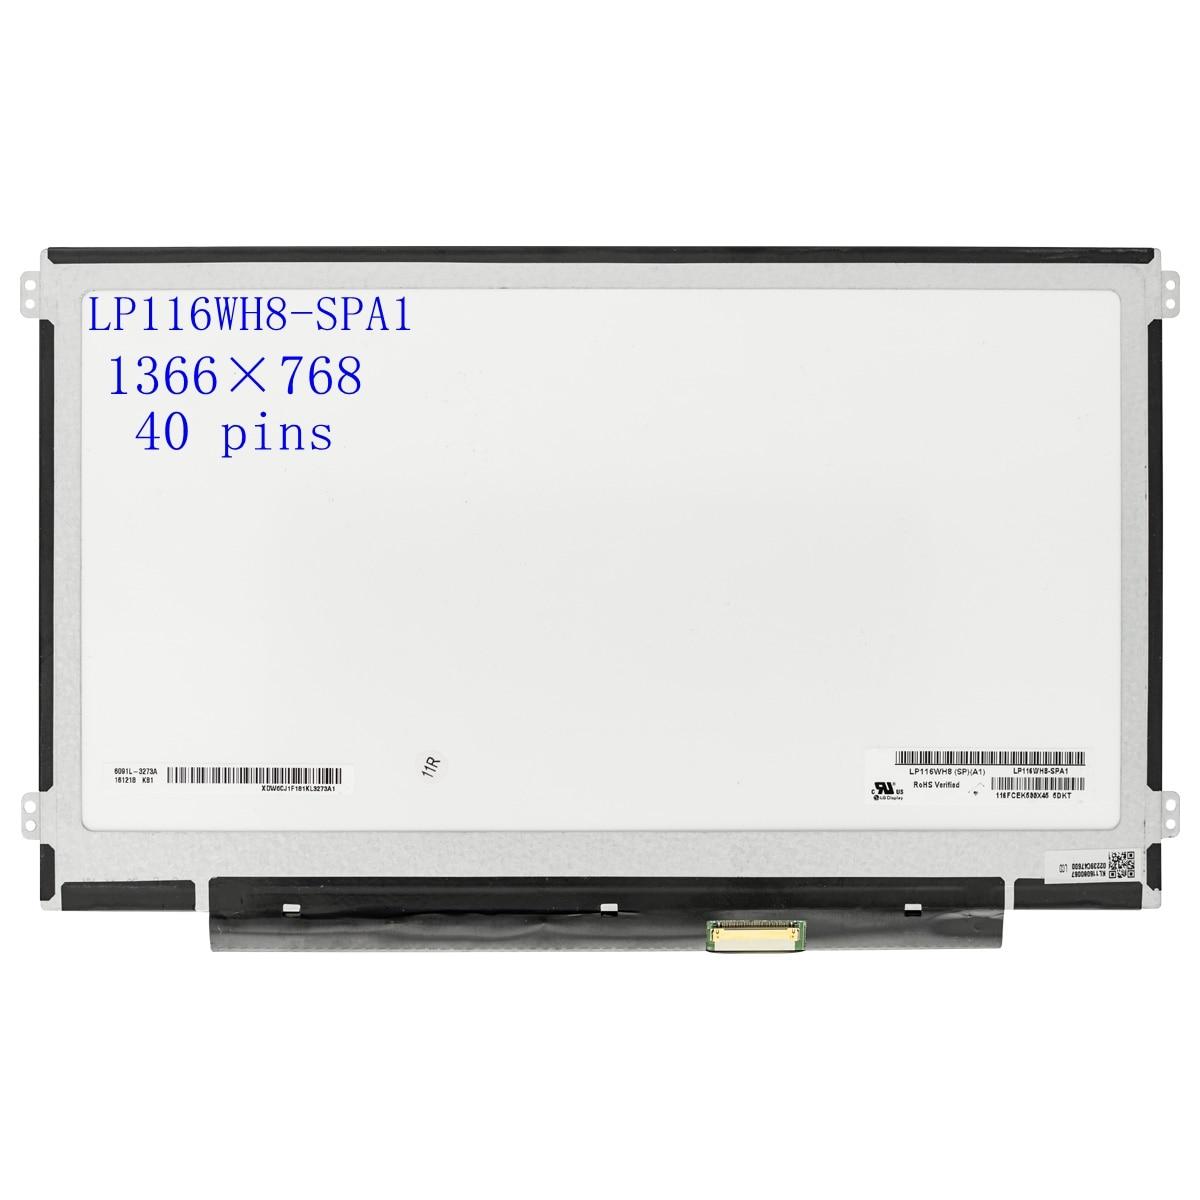 Recambio de pantalla de matriz lcd de 11,6 pulgadas, LP116WH6-SLA1 LP116WH6 (SL)(A1),...